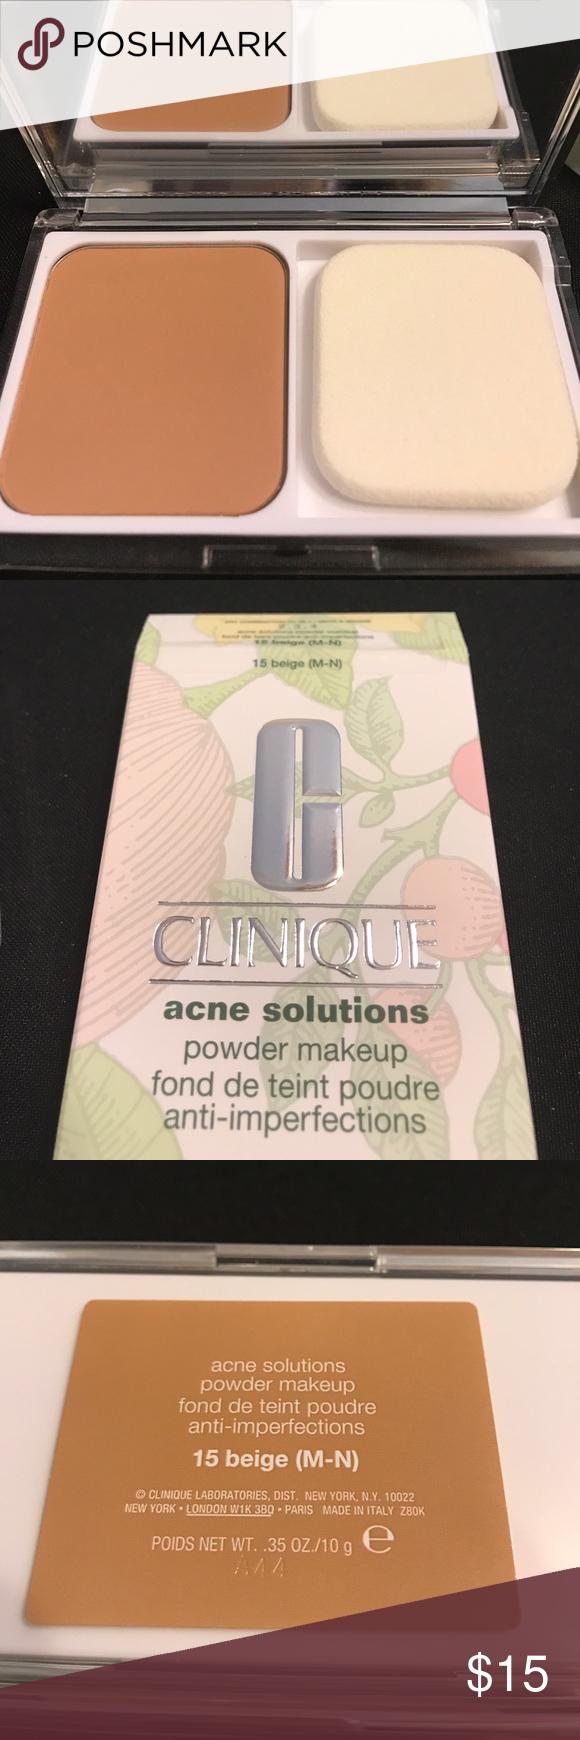 Clinique 15 Acne Solutions Powder. New Beige MN Clinique